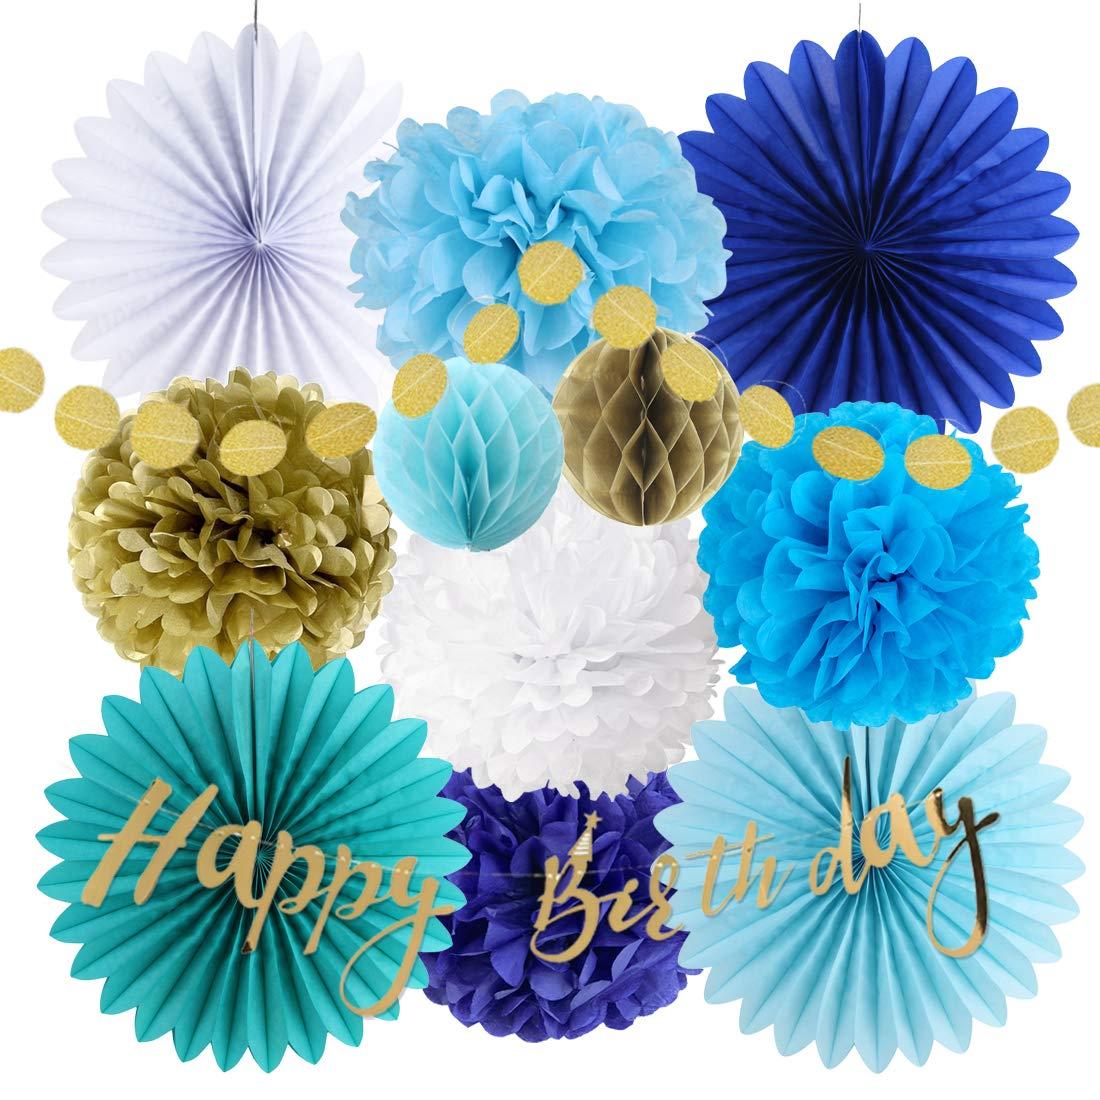 Easy Joy Blue Gold Boys Birthday Party Hanging Decoration Kit Happy Birthday Banner Paper Fans Tissue Pom Poms Flowers (Blue)